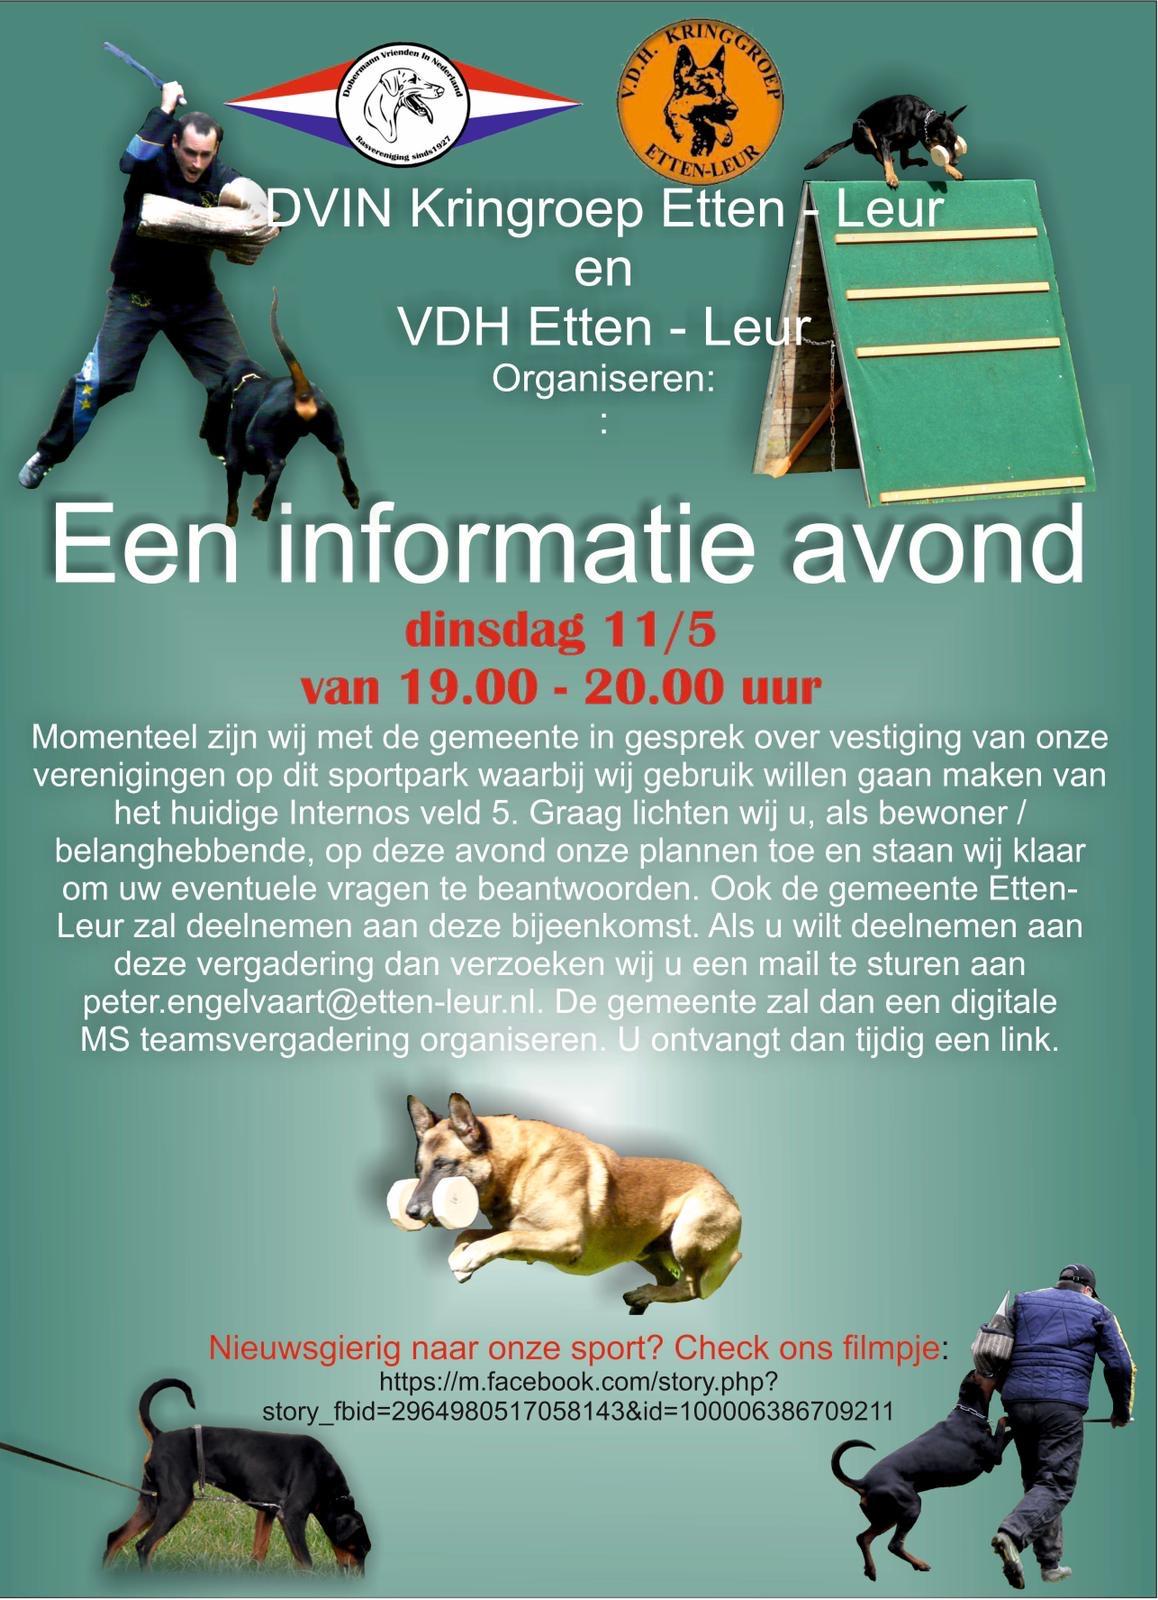 Informatie avond 11-5: Hondenvereniging op veld 5